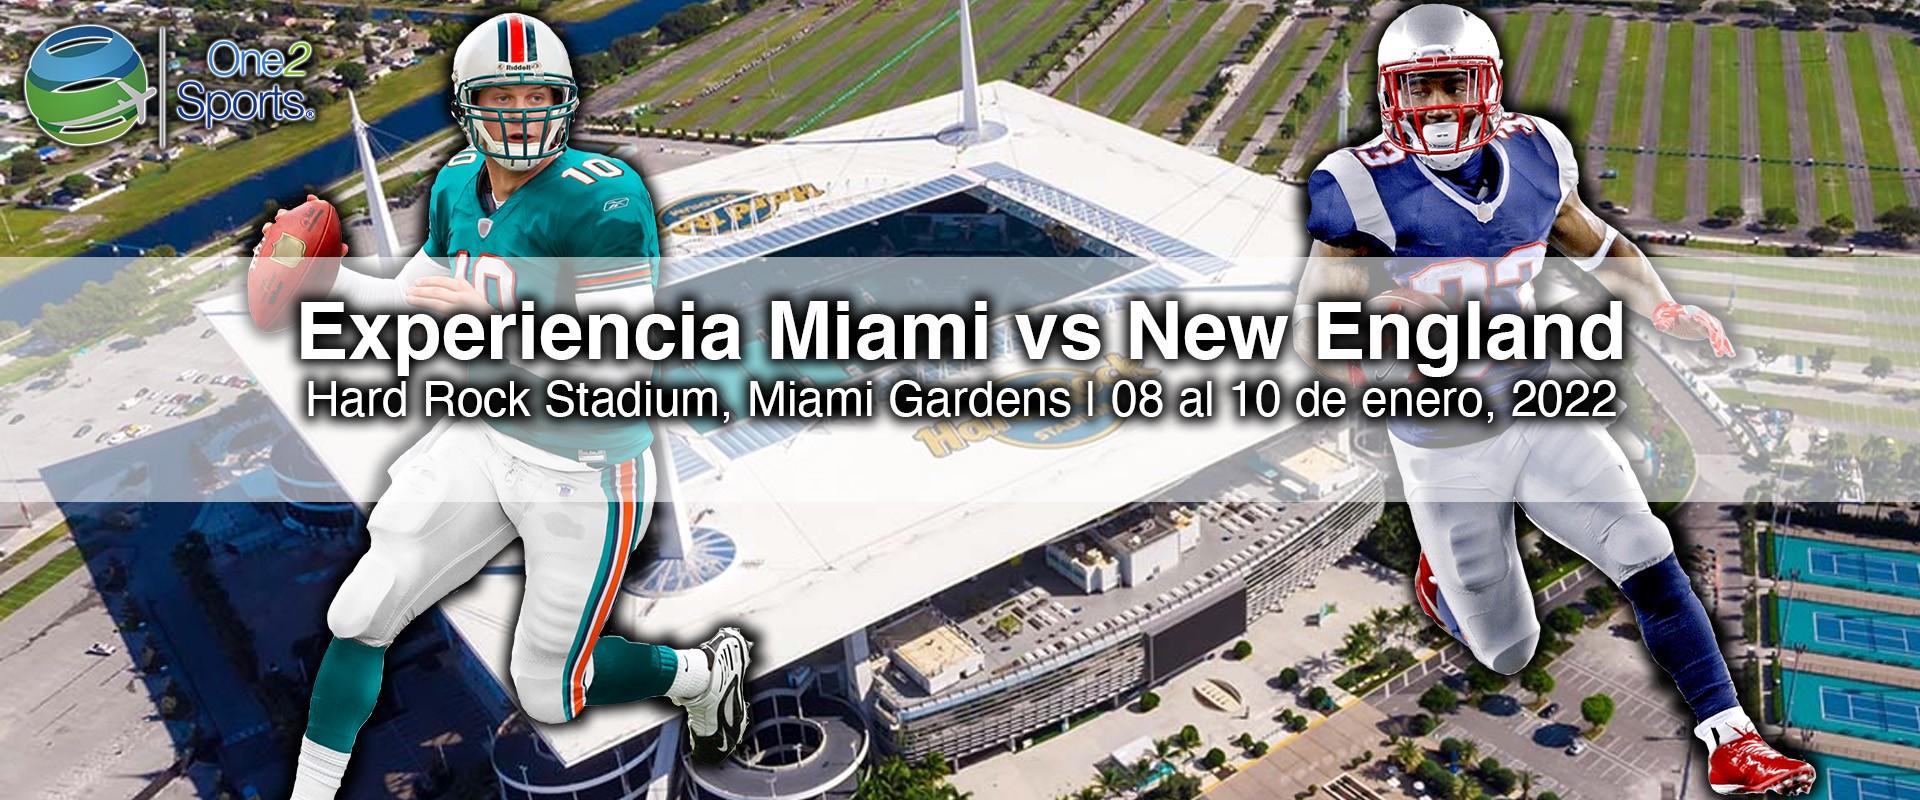 Miami vs New England